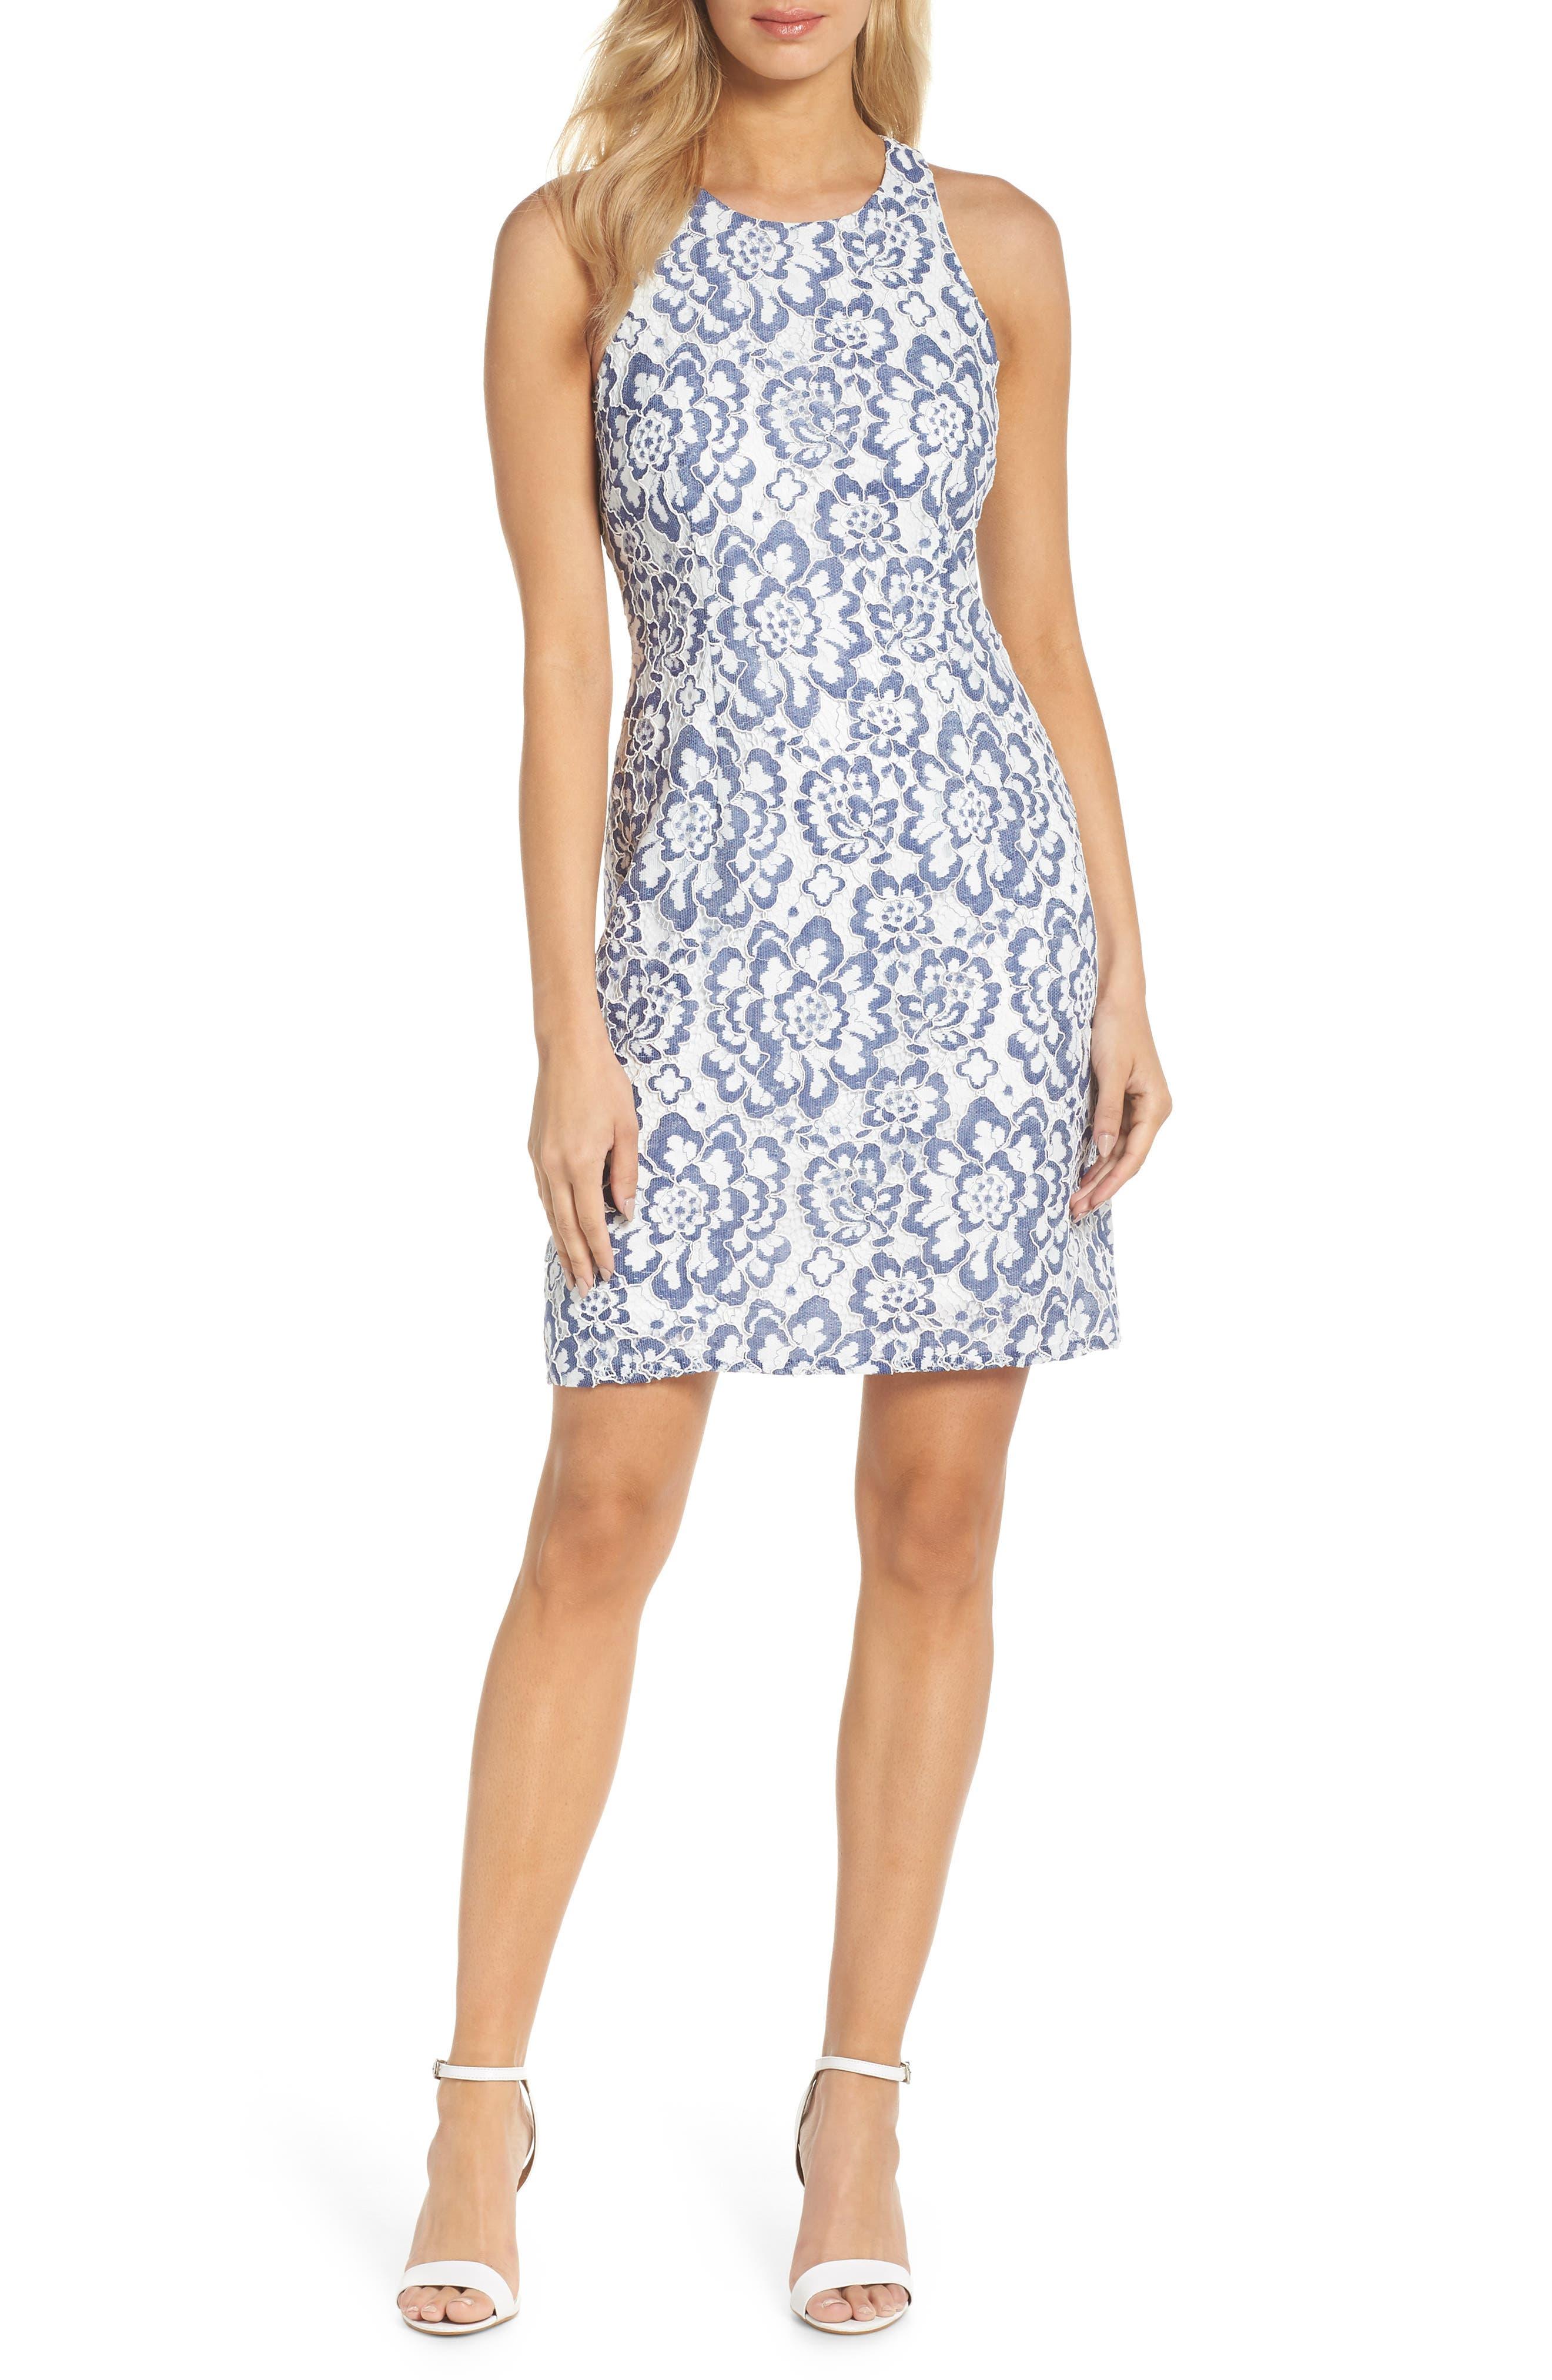 Elisa Two Tone Lace Sheath Dress,                             Main thumbnail 1, color,                             Blue/ White